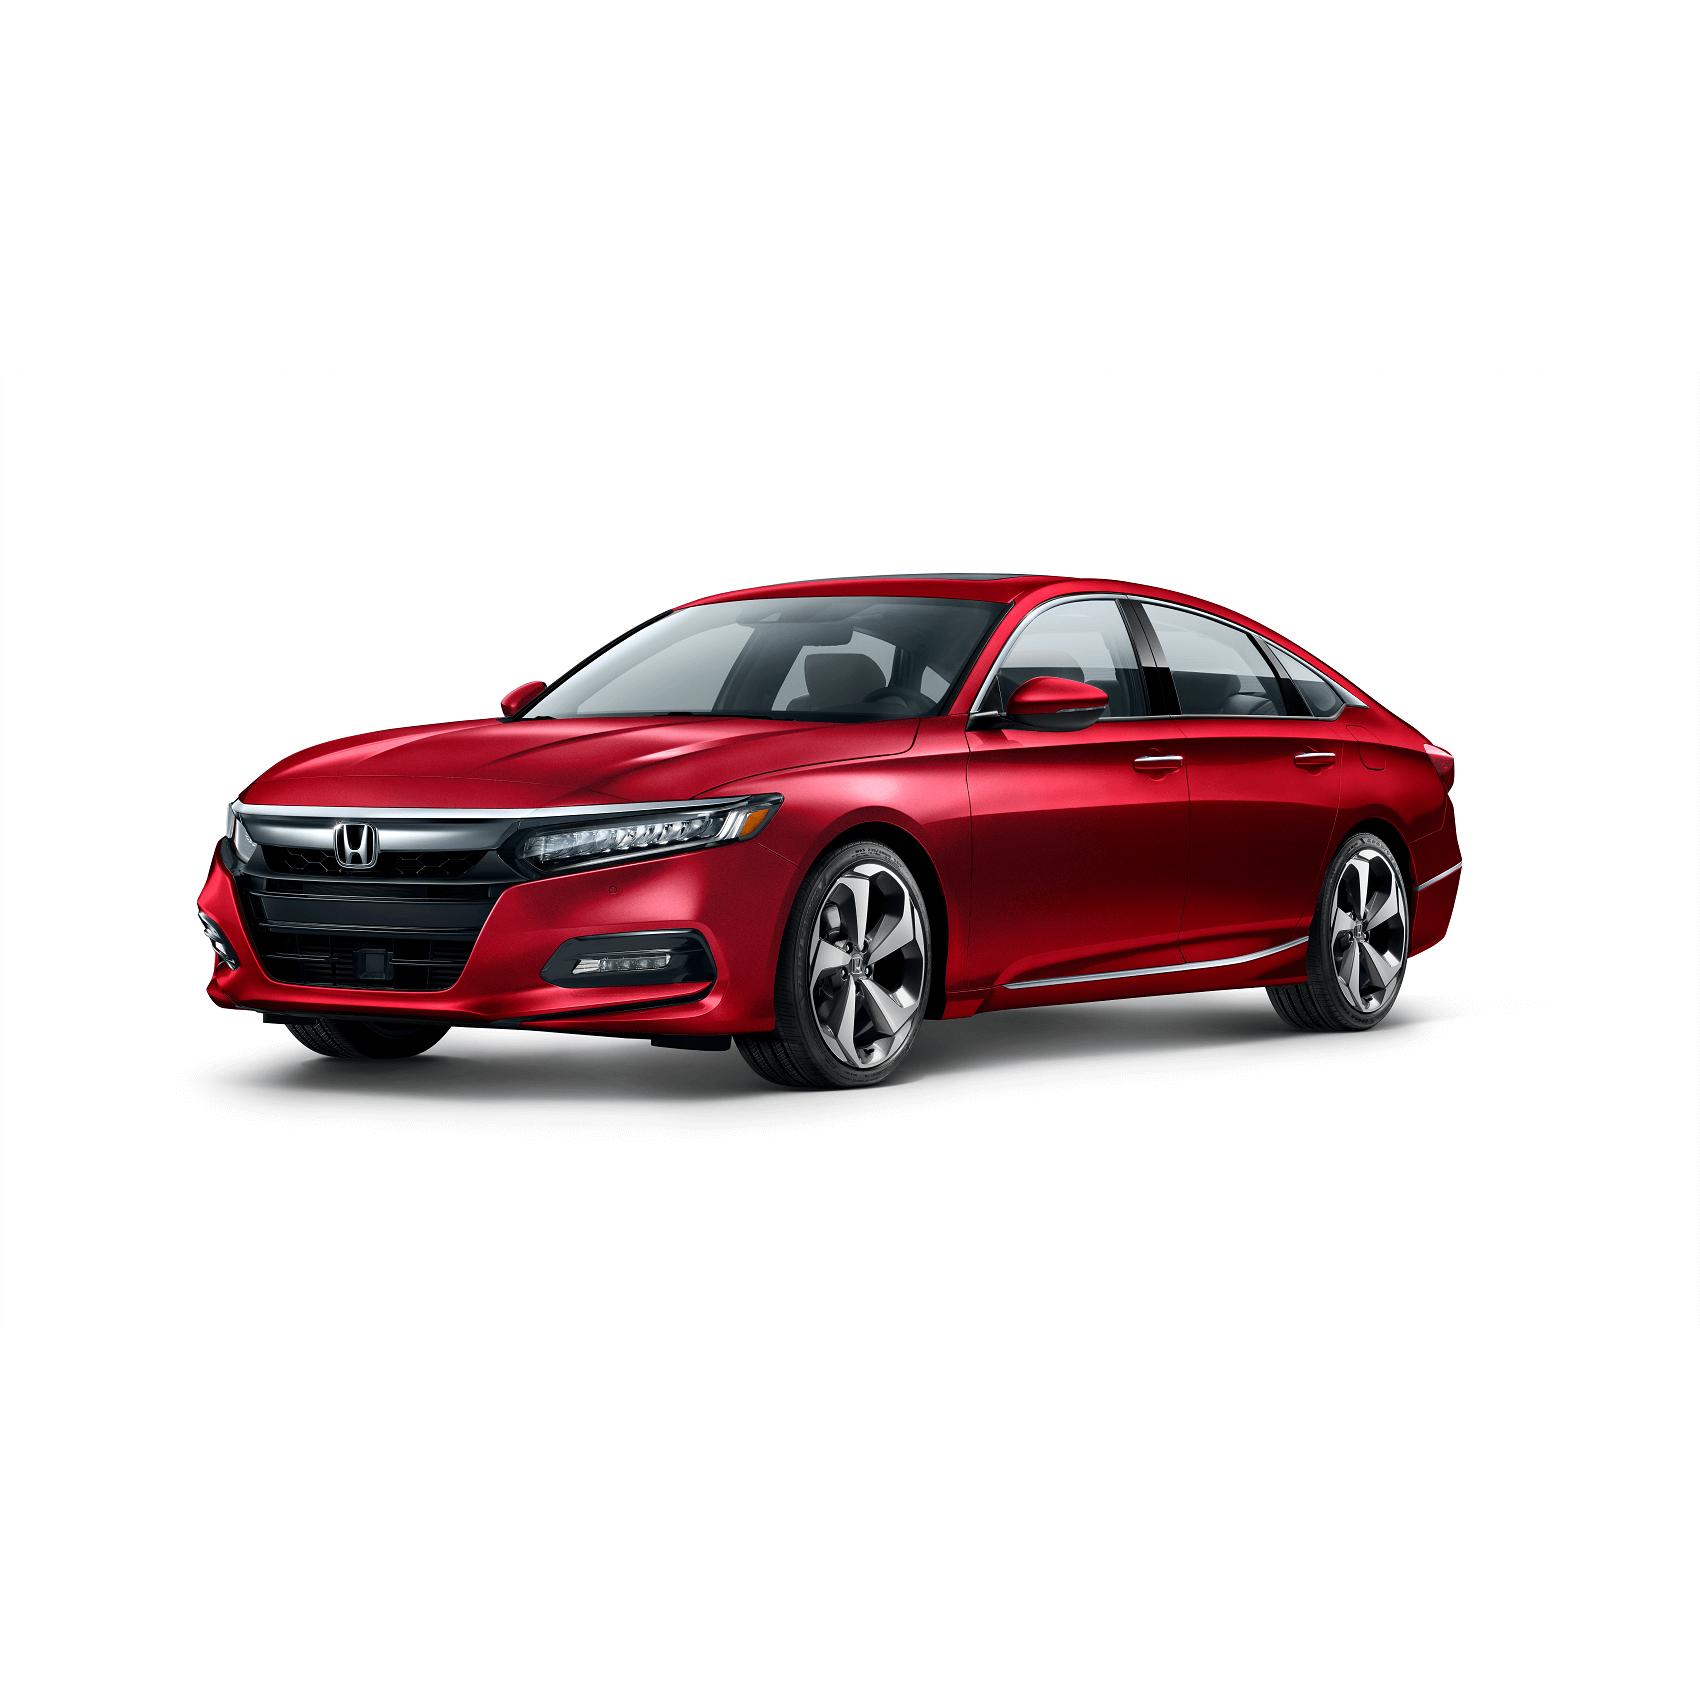 2020 Honda Accord Radiant Metallic Red